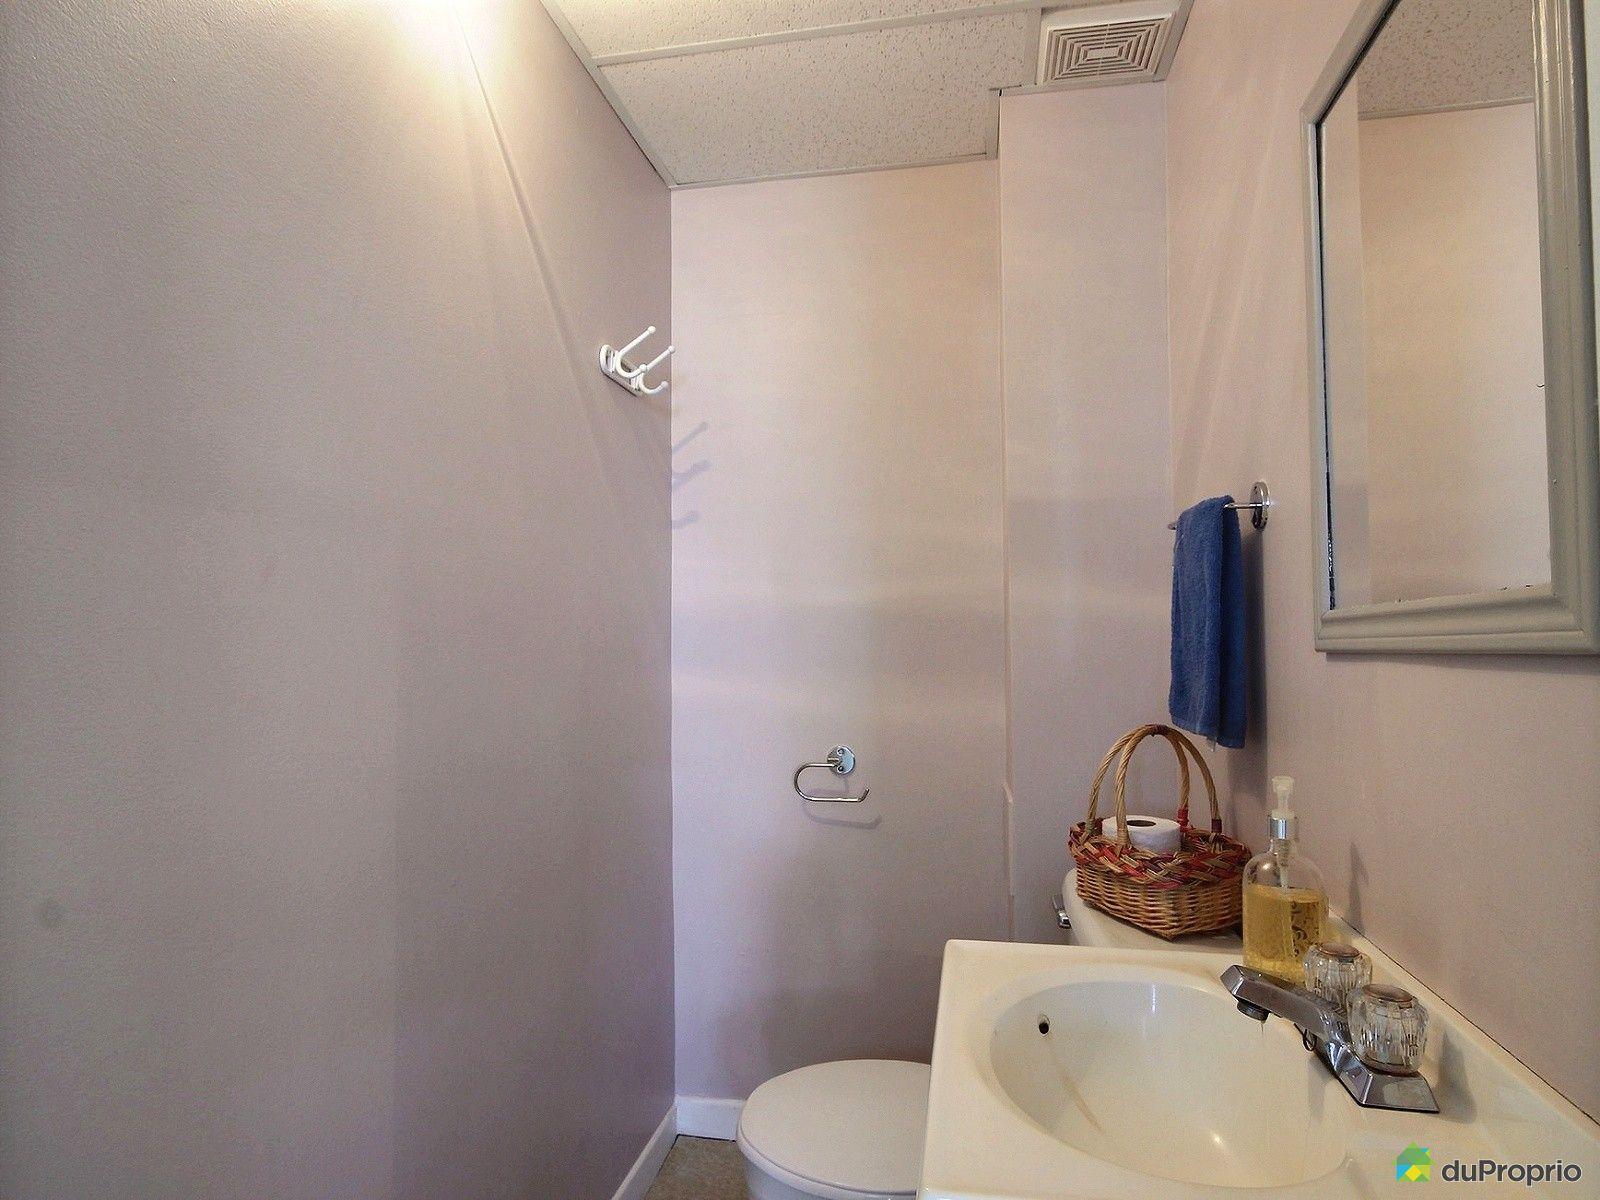 House For Sale In Shawinigan Sud 3190 5e Avenue